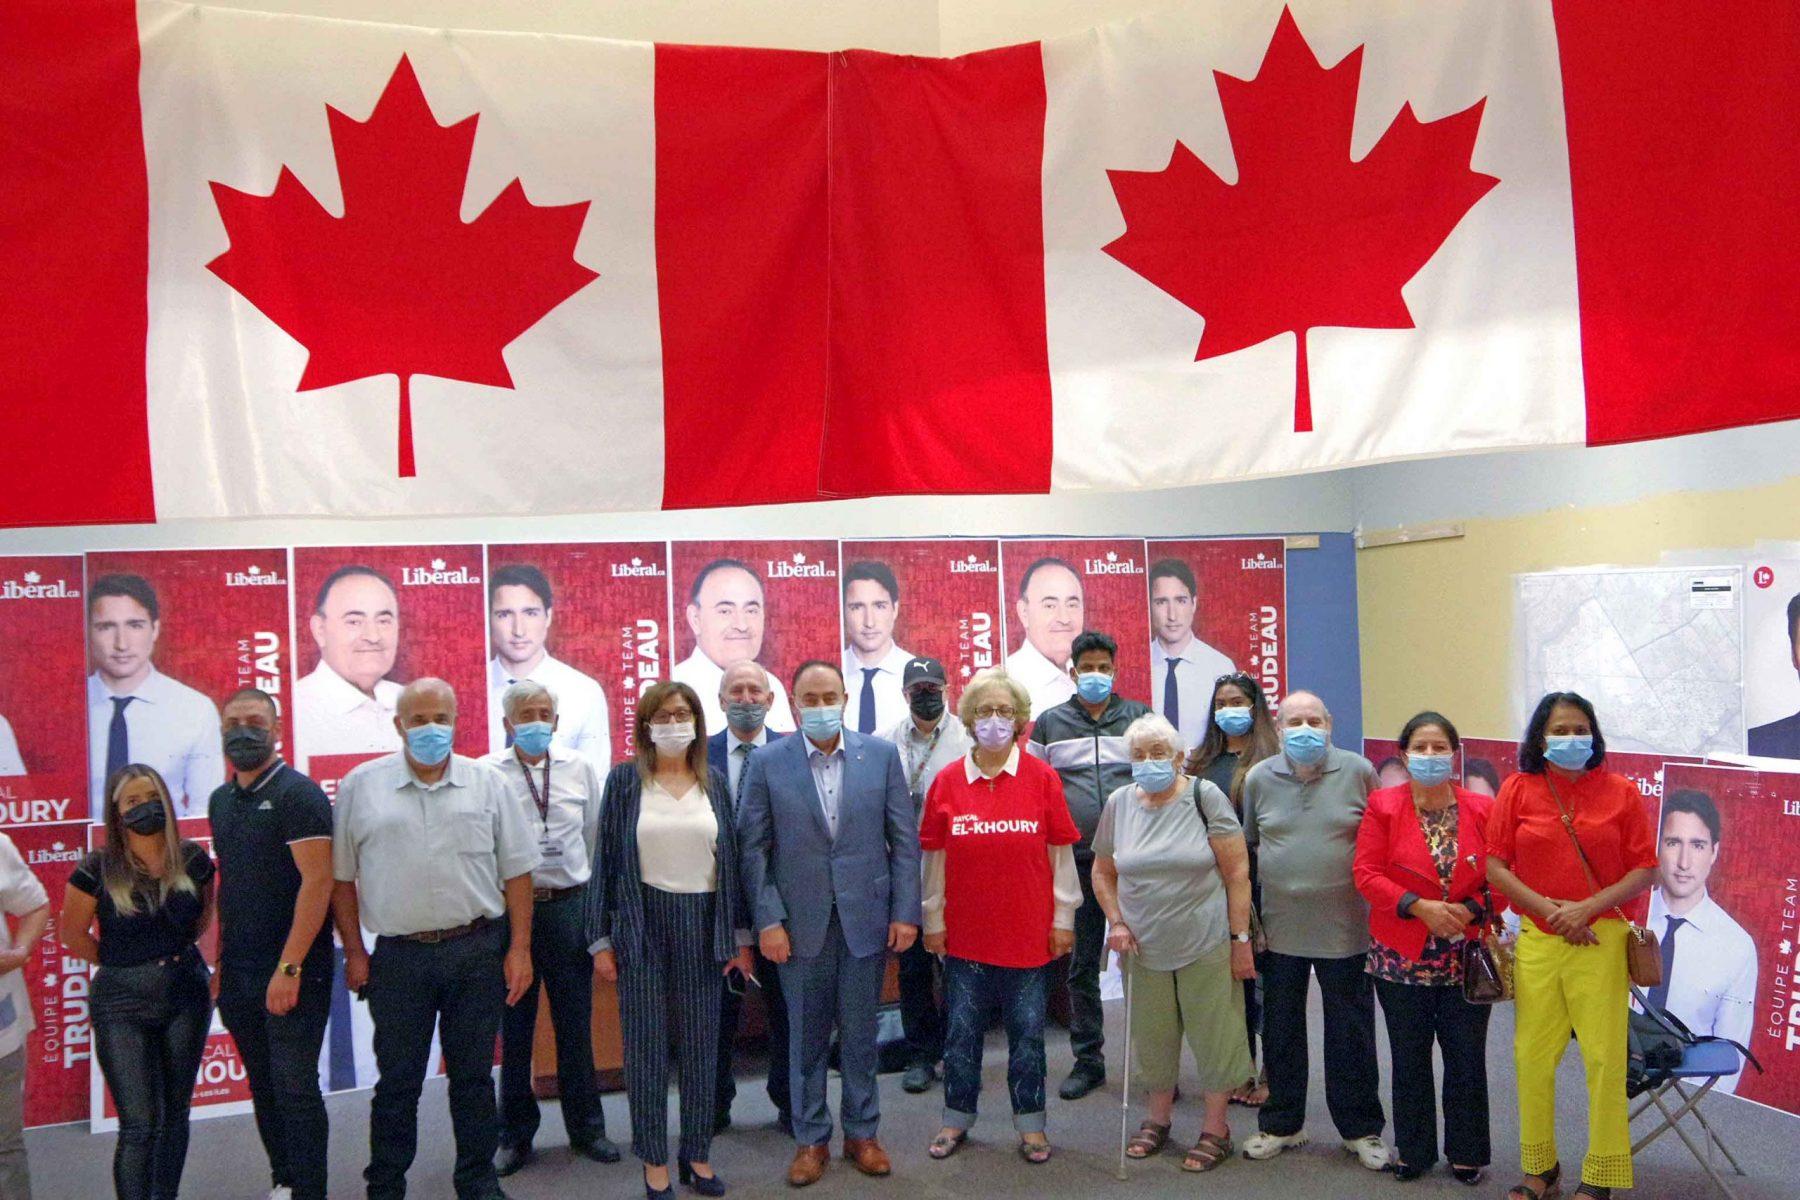 Laval-Les Îles Liberal Fayçal El-Khoury wins a third term